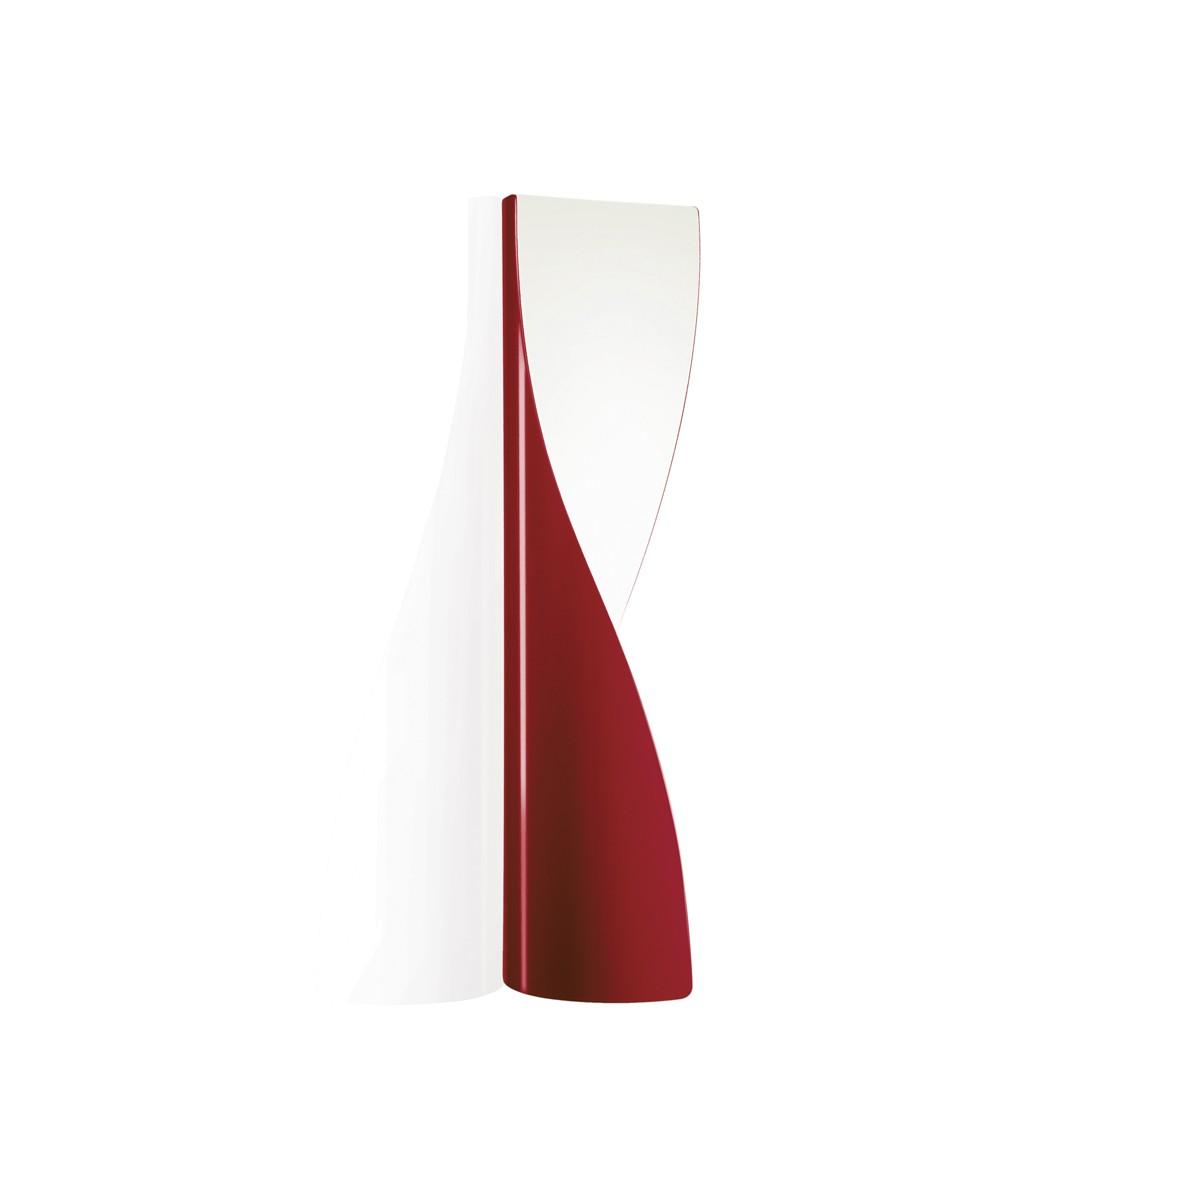 Kundalini Evita LED Wandleuchte, rot glänzend